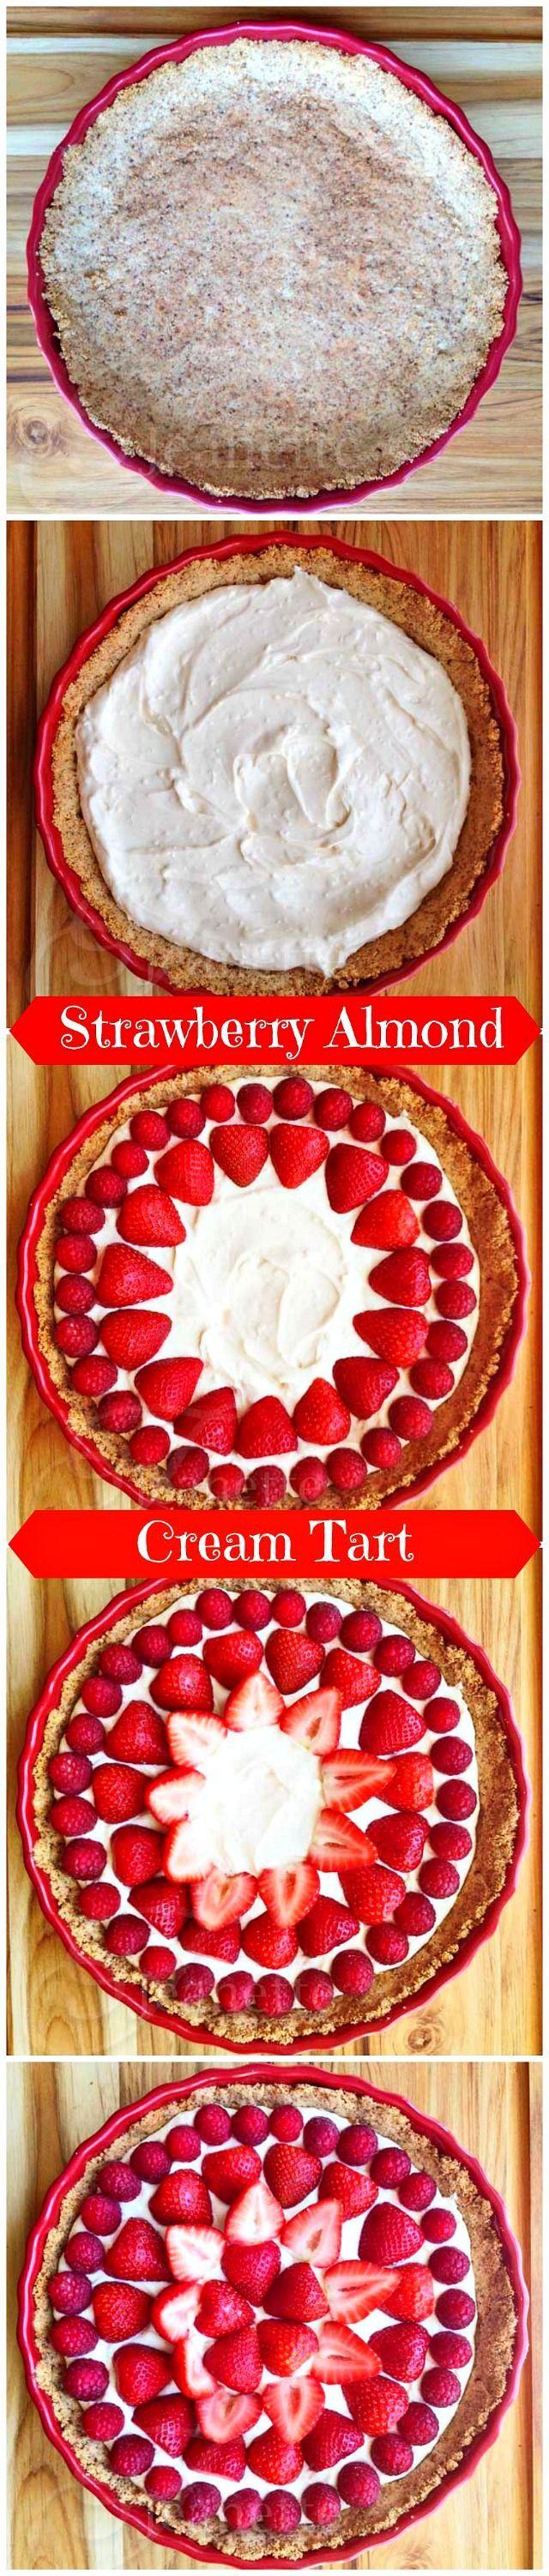 Strawberry Almond Cream Tart - Can't Believe It's Gluten-Free (Shared) -